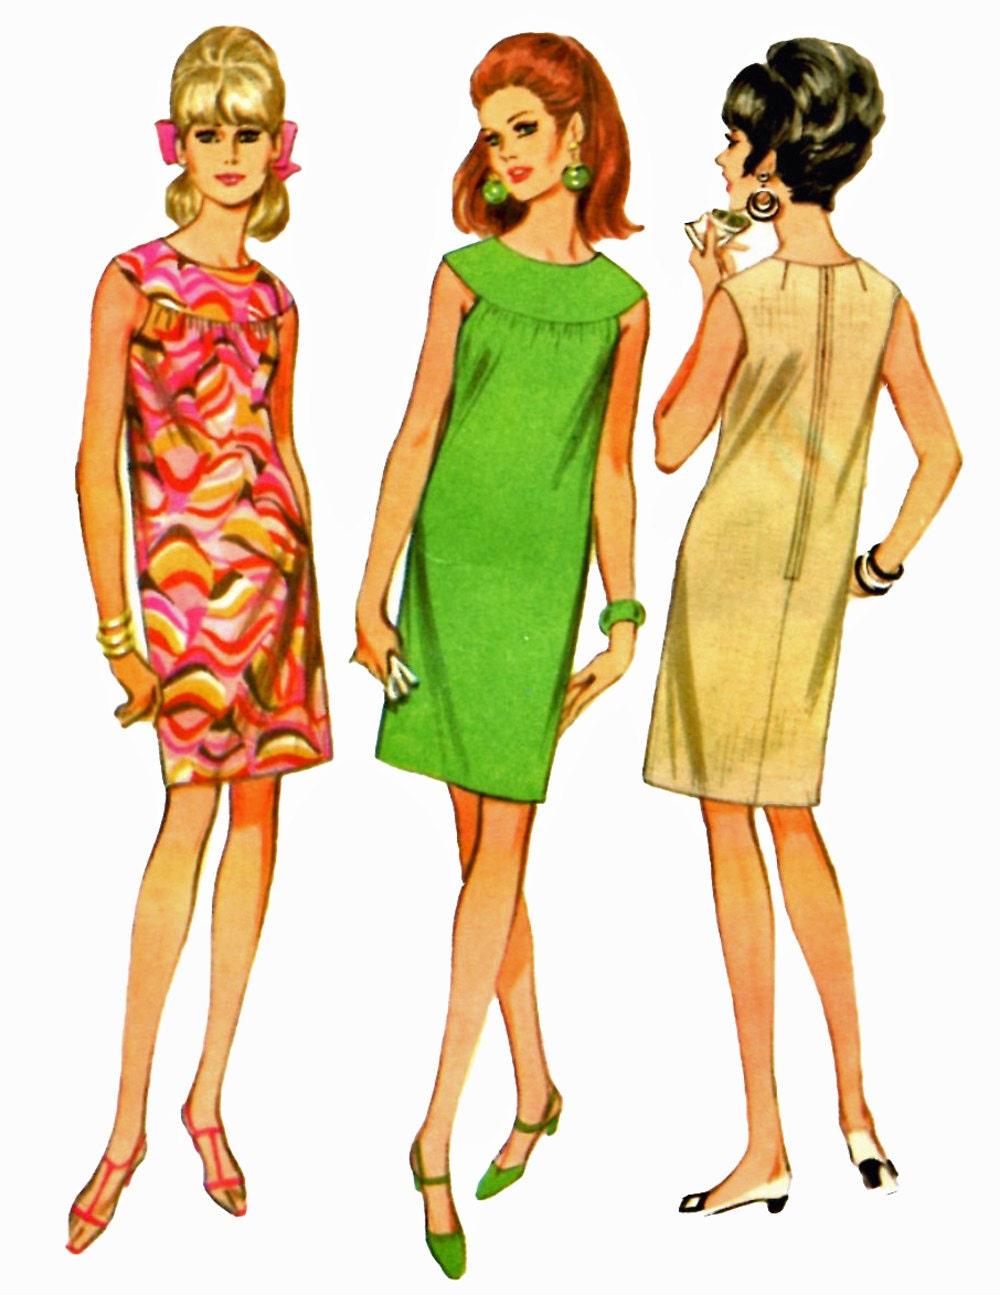 Mccalls 8824 1960s sleeveless shift dress sewing by retromonkeys